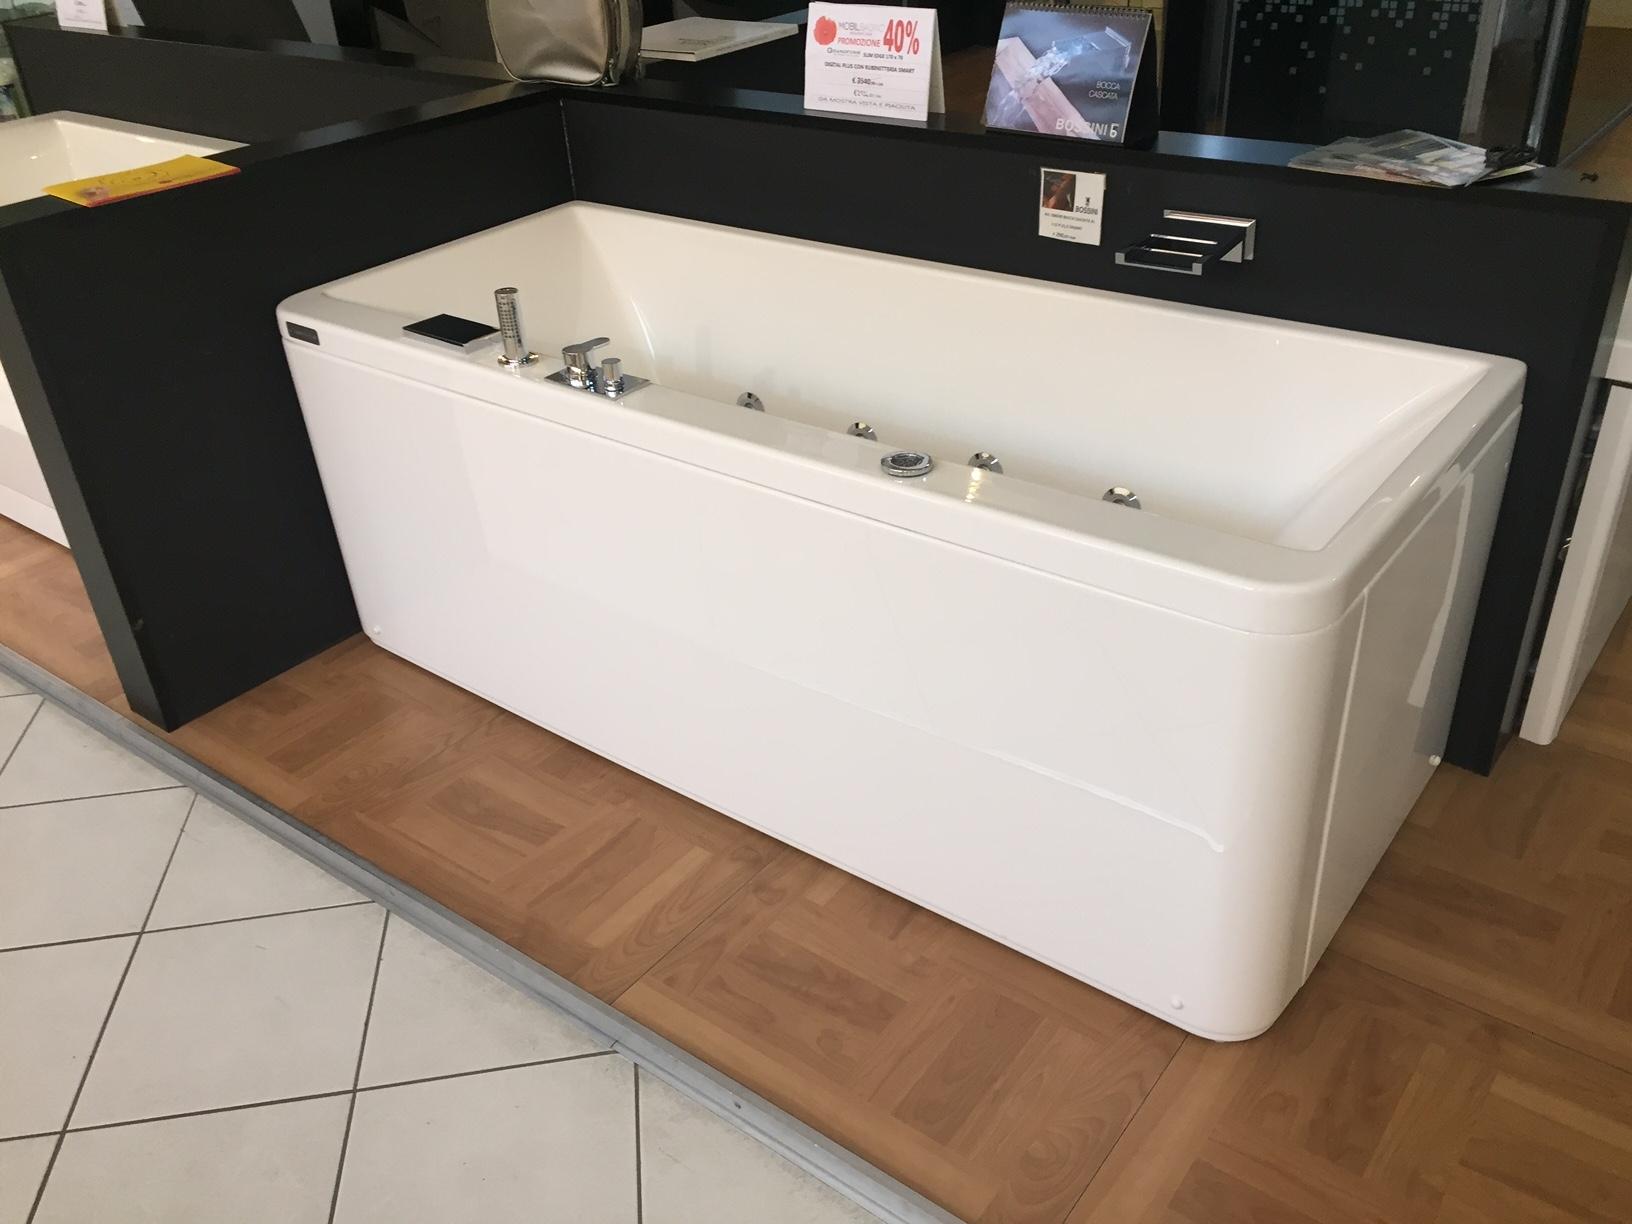 Vasca idro grandform slim edge 170x70 con rubinetteria for Arredo bagno vasca